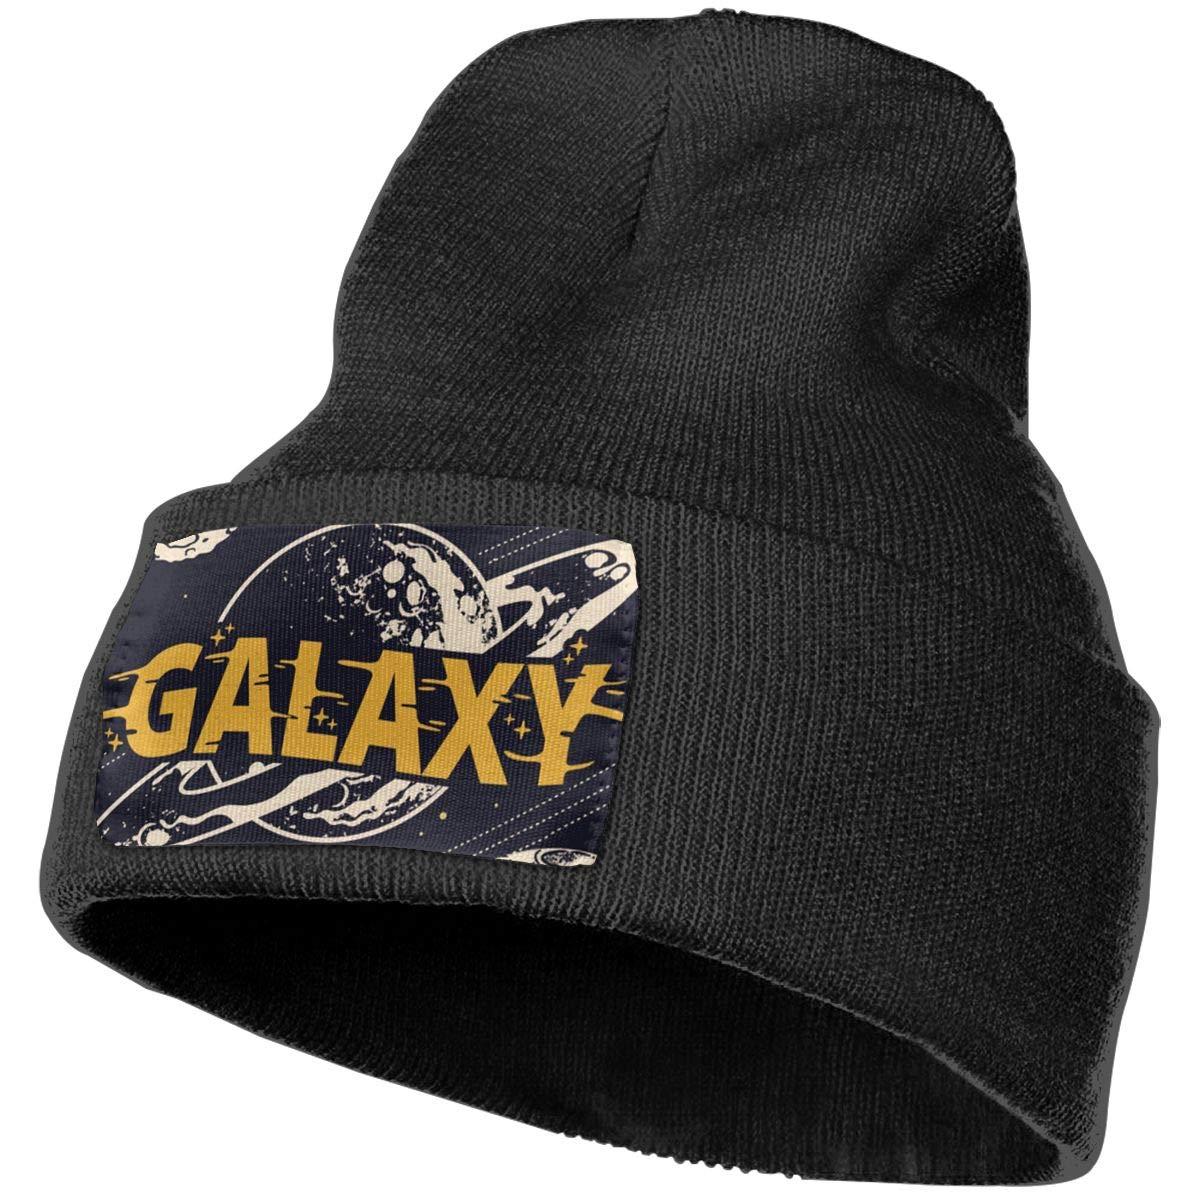 Horizon-t Galaxy Unisex 100/% Acrylic Knitting Hat Cap Fashion Beanie Hat